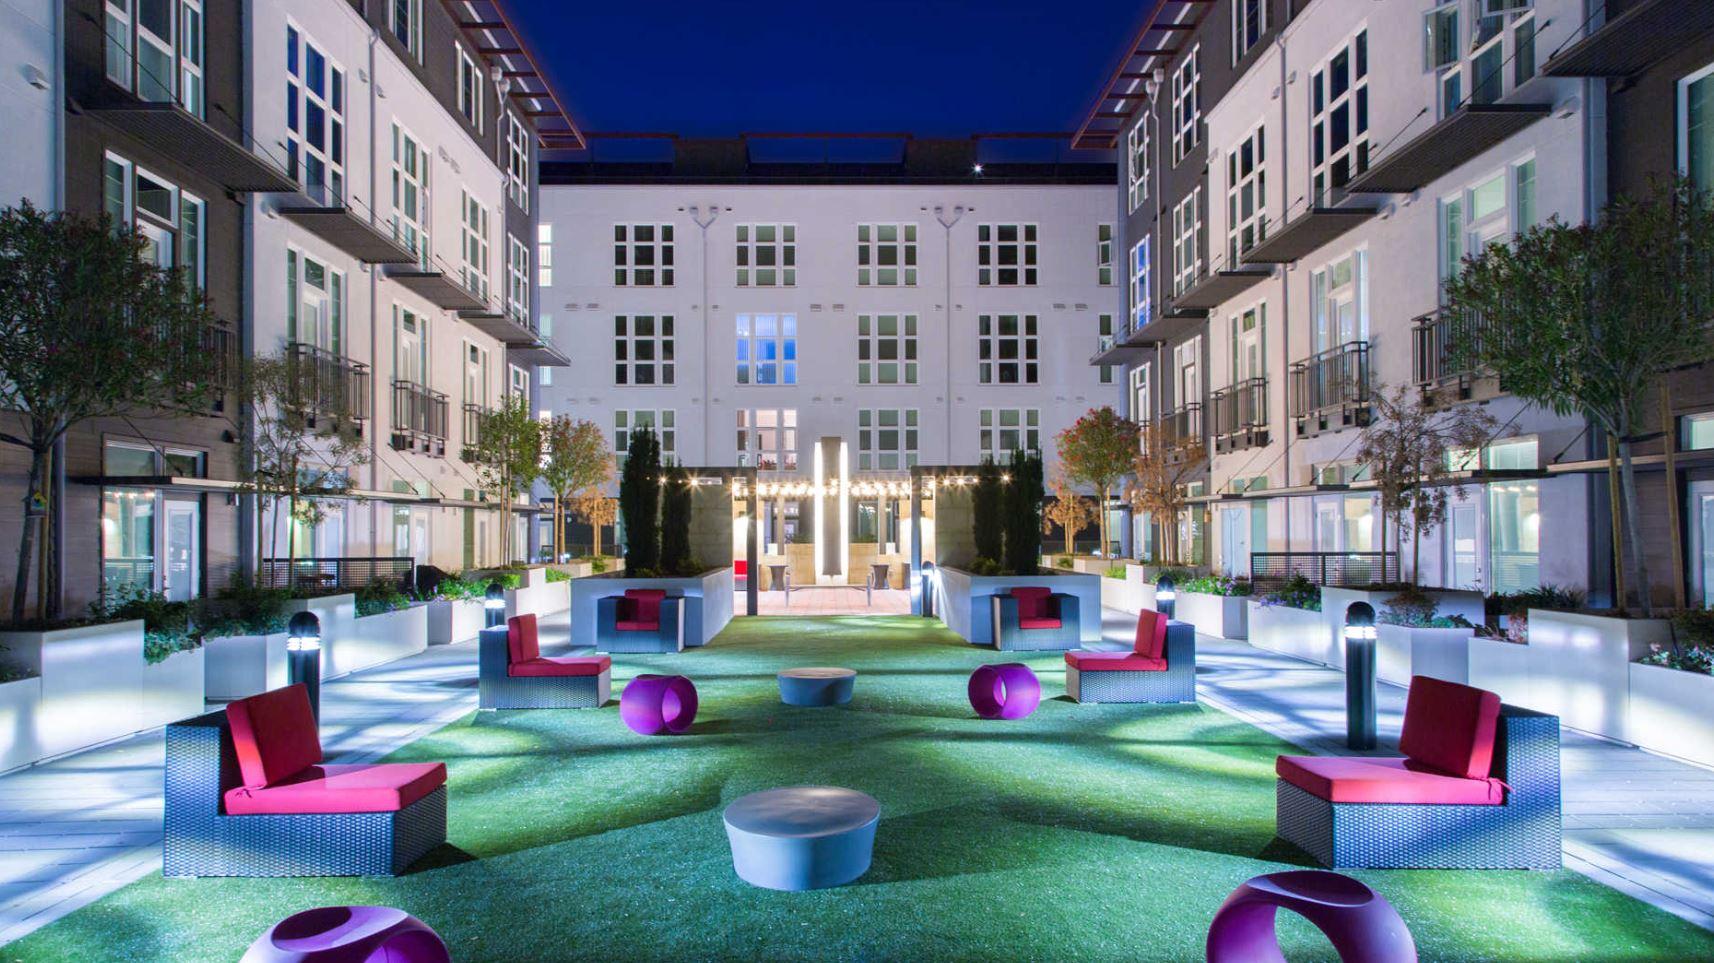 Ground at The Domain Apartments, Renaisance, San Jose